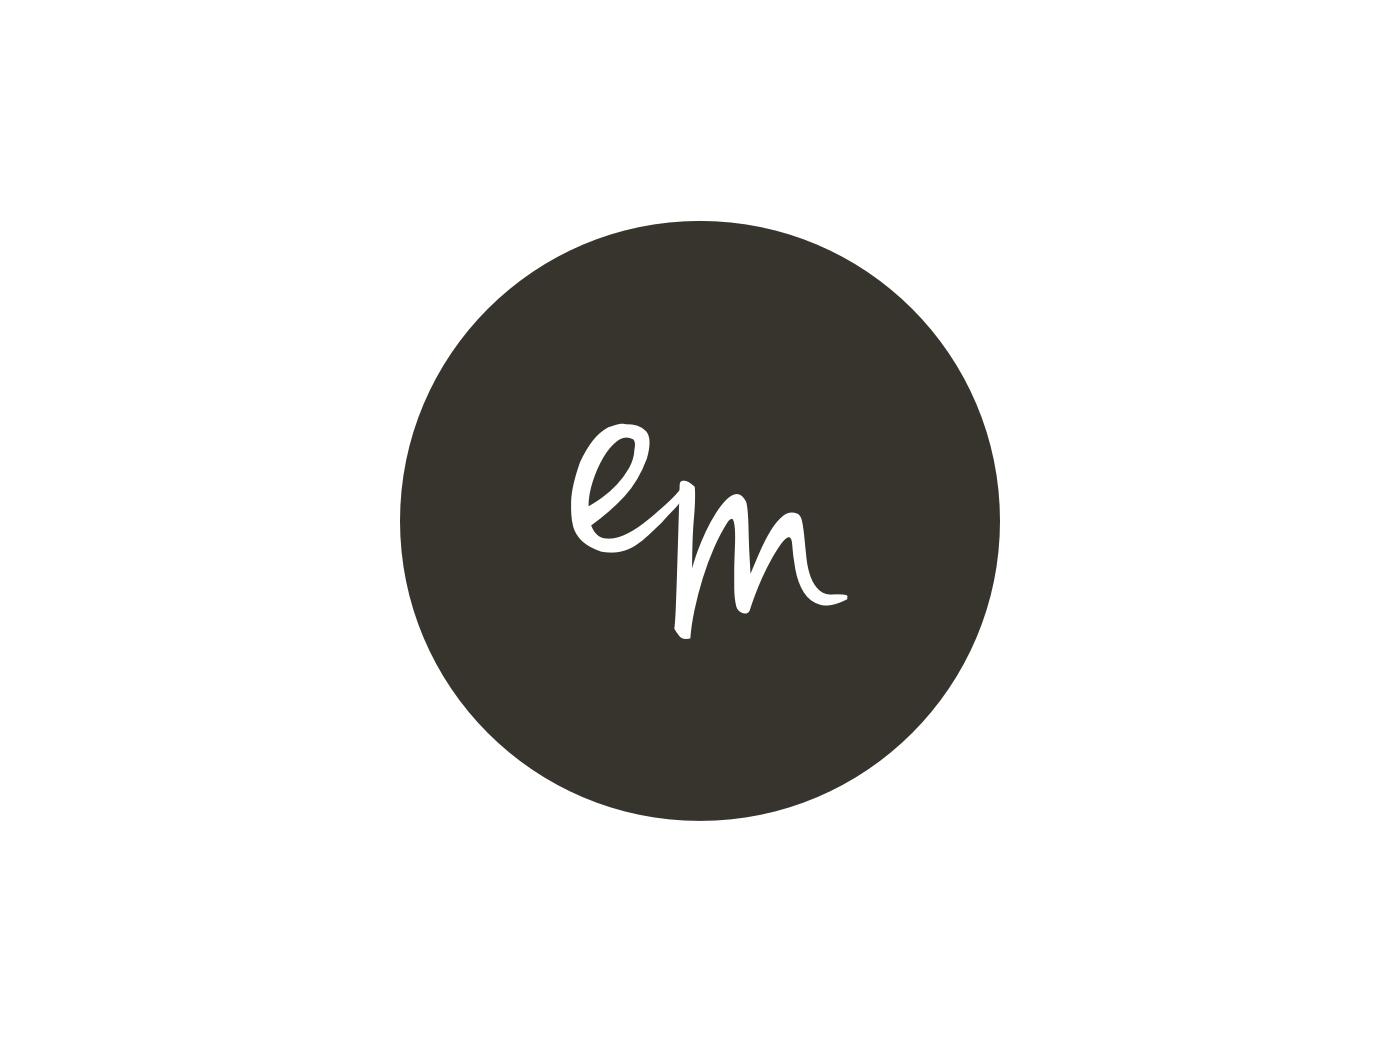 Elissa Mae Creative | Mark brand mark sketch app brand identity logo branding